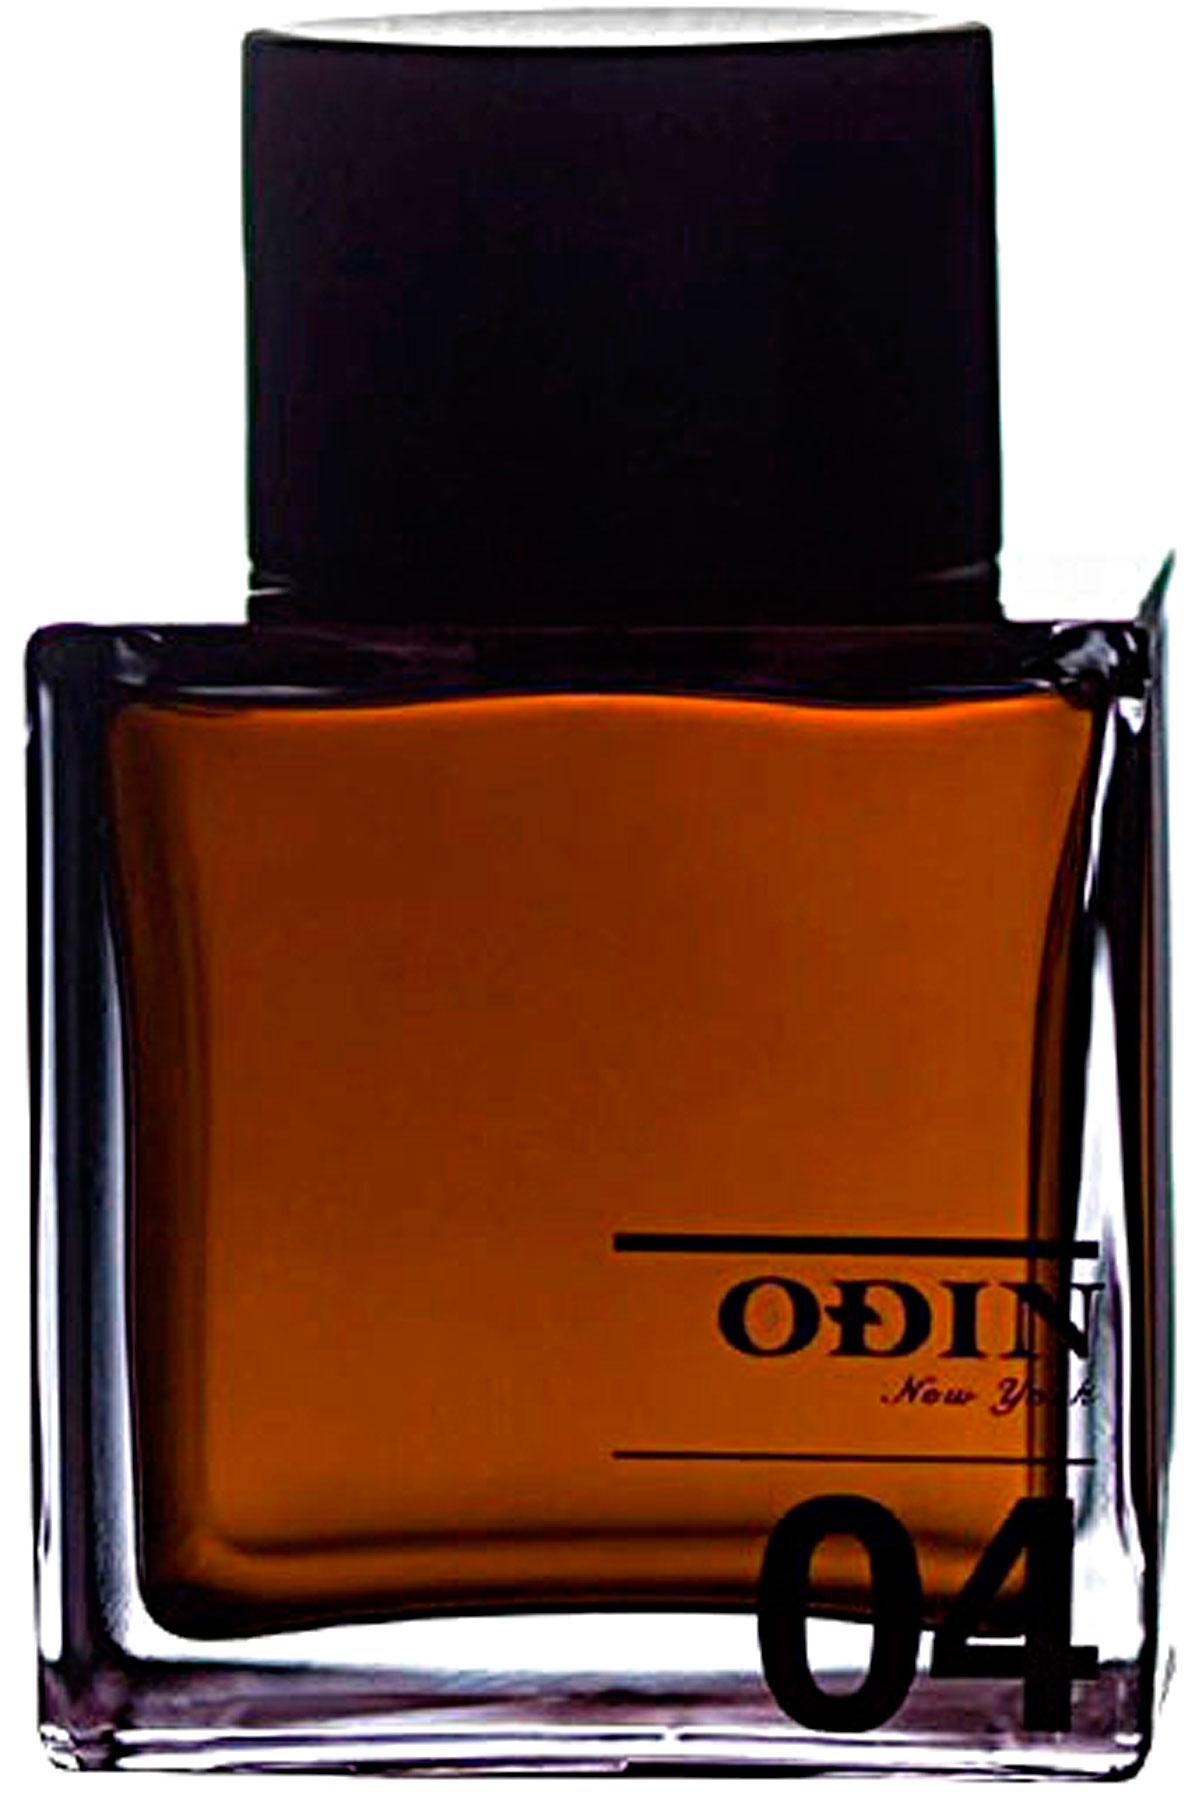 Odin New York Fragrances for Men, 04 Petrana - Eau De Parfum - 100 Ml, 2019, 100 ml